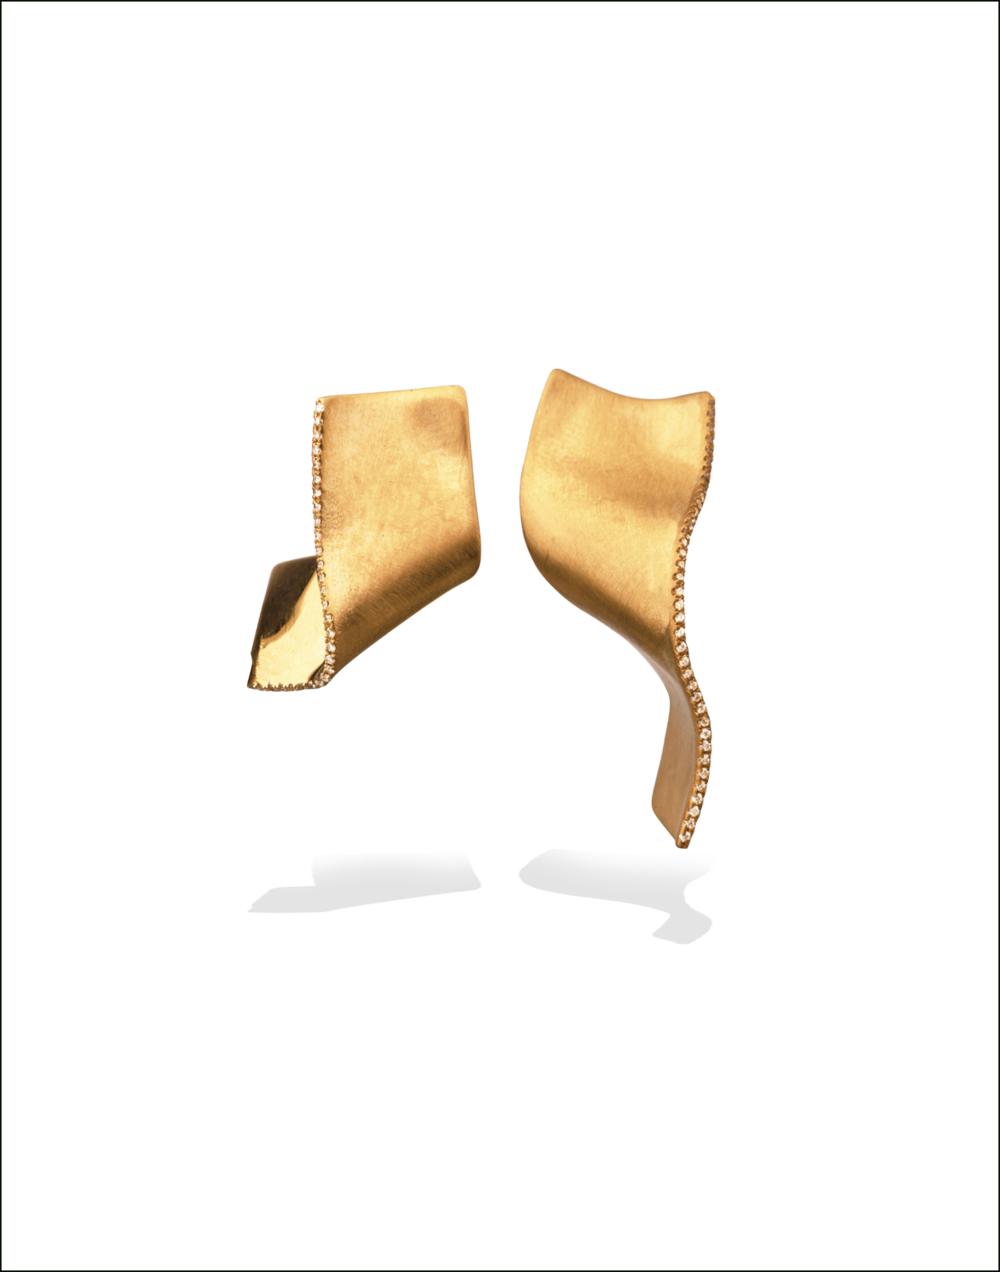 Gold-Diamond-Earrings-Memories-of-Water-Completedworks-Fine-Jewellery-2-1.png